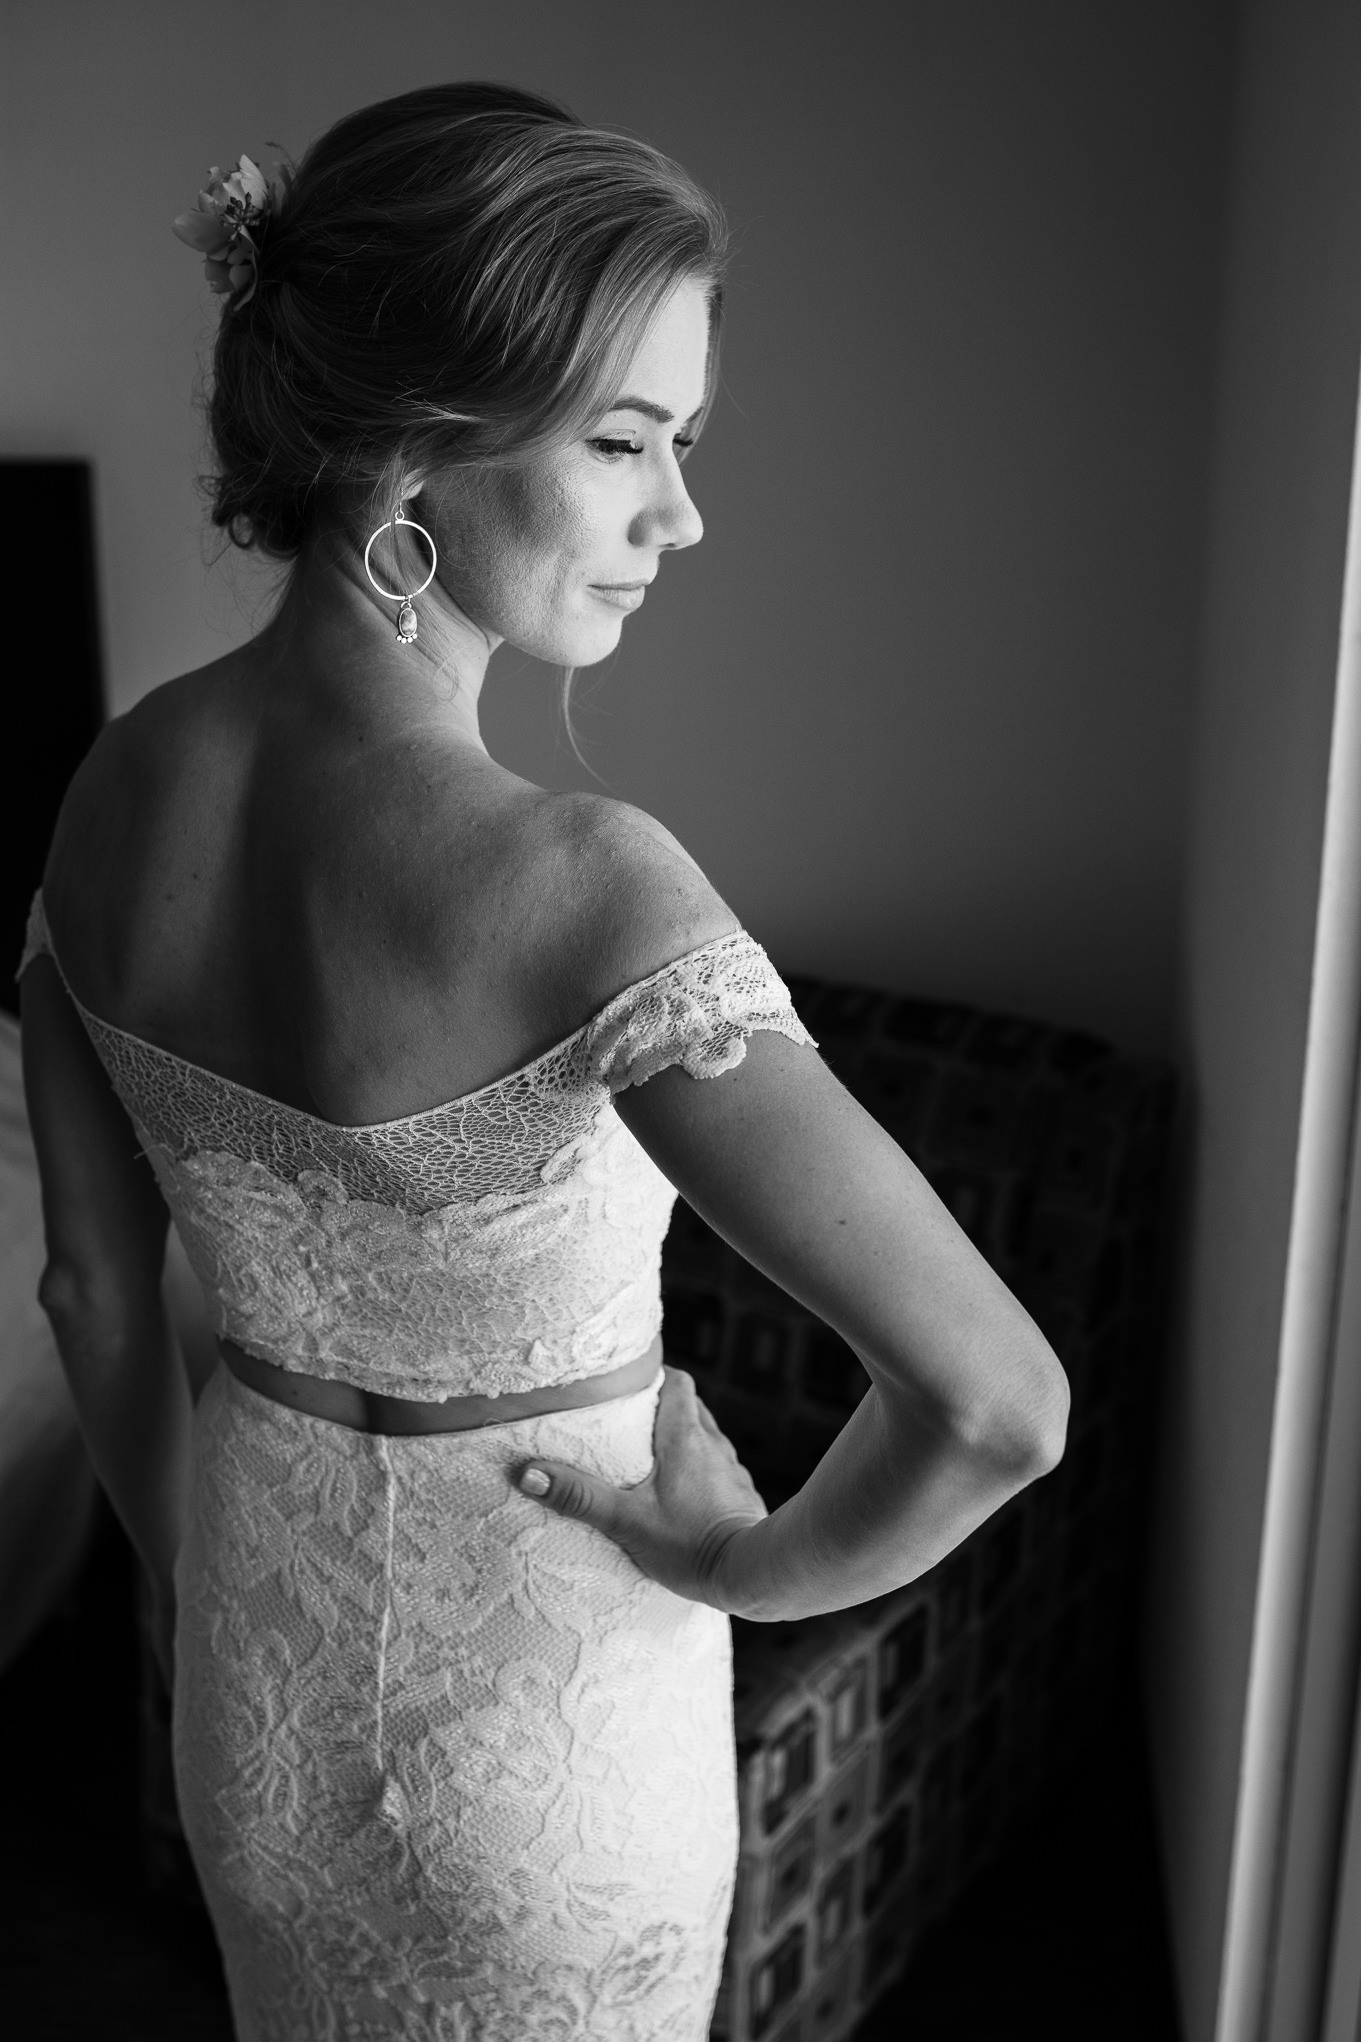 045_ONL_Jenny_Ken_Wedding_Trevor_Hooper_Photo.jpg